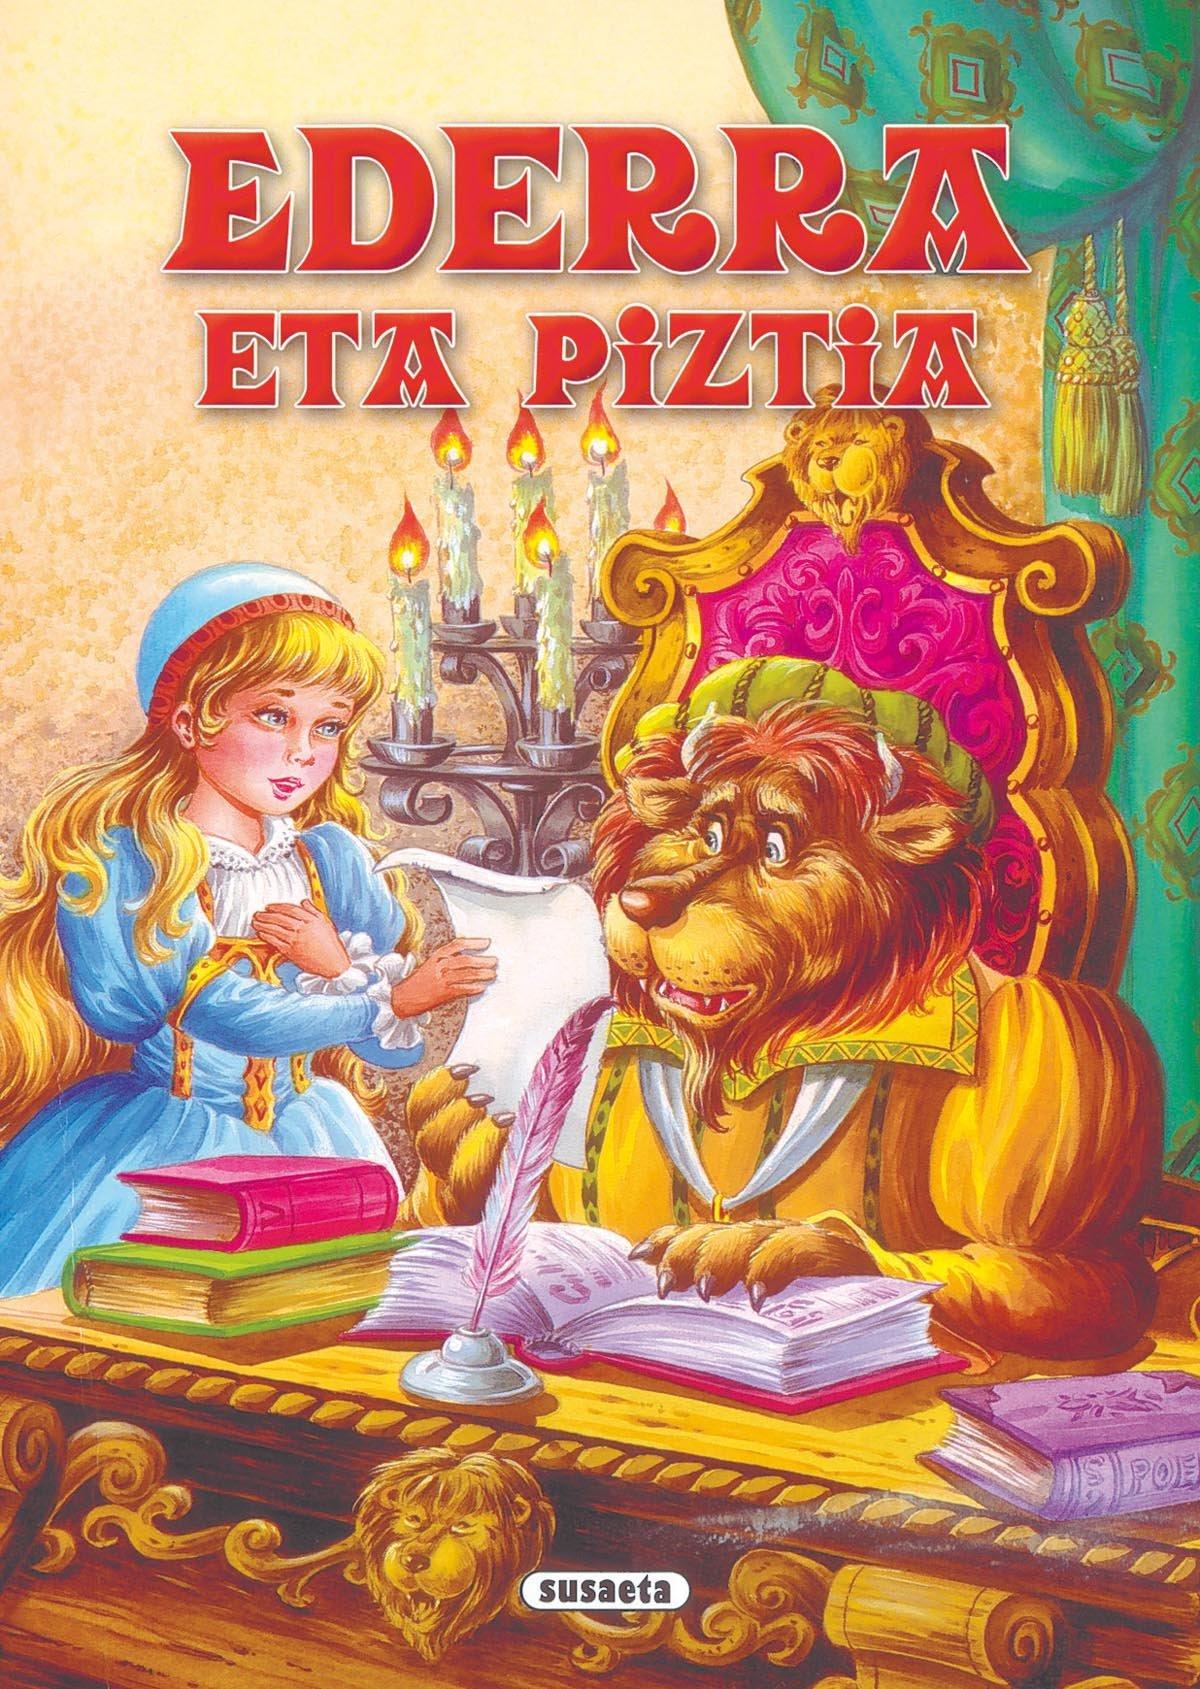 Ederra eta piztia (Arlekin Bilduma) (Euskera) Libro de cartón – 9 nov 2016 Equipo Susaeta 8467701676 Cuentos tradicionales Libros Ilustrados